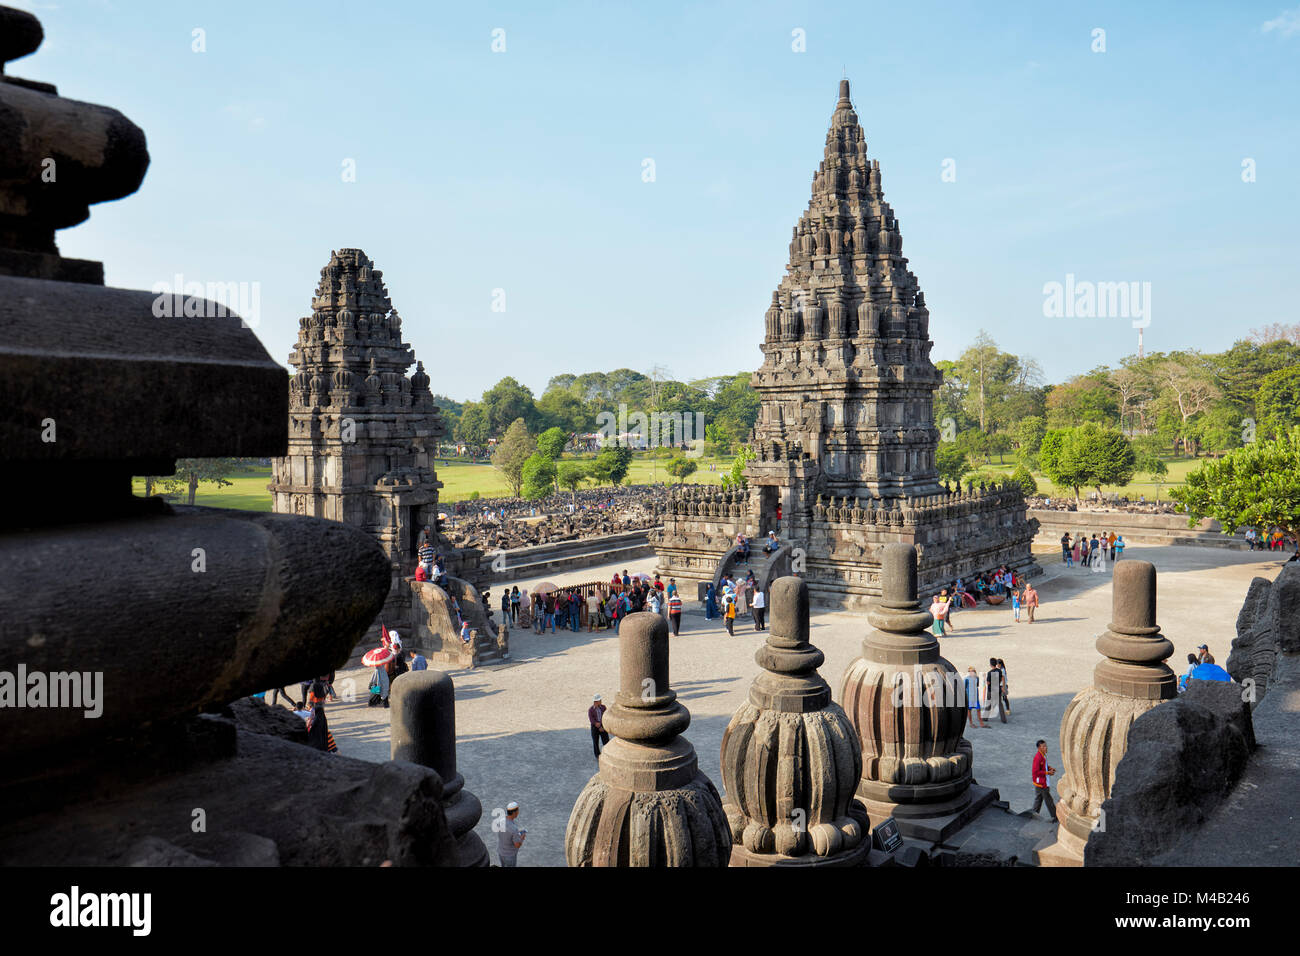 Prambanan Hindu Temple Compound. Special Region of Yogyakarta, Java, Indonesia. - Stock Image